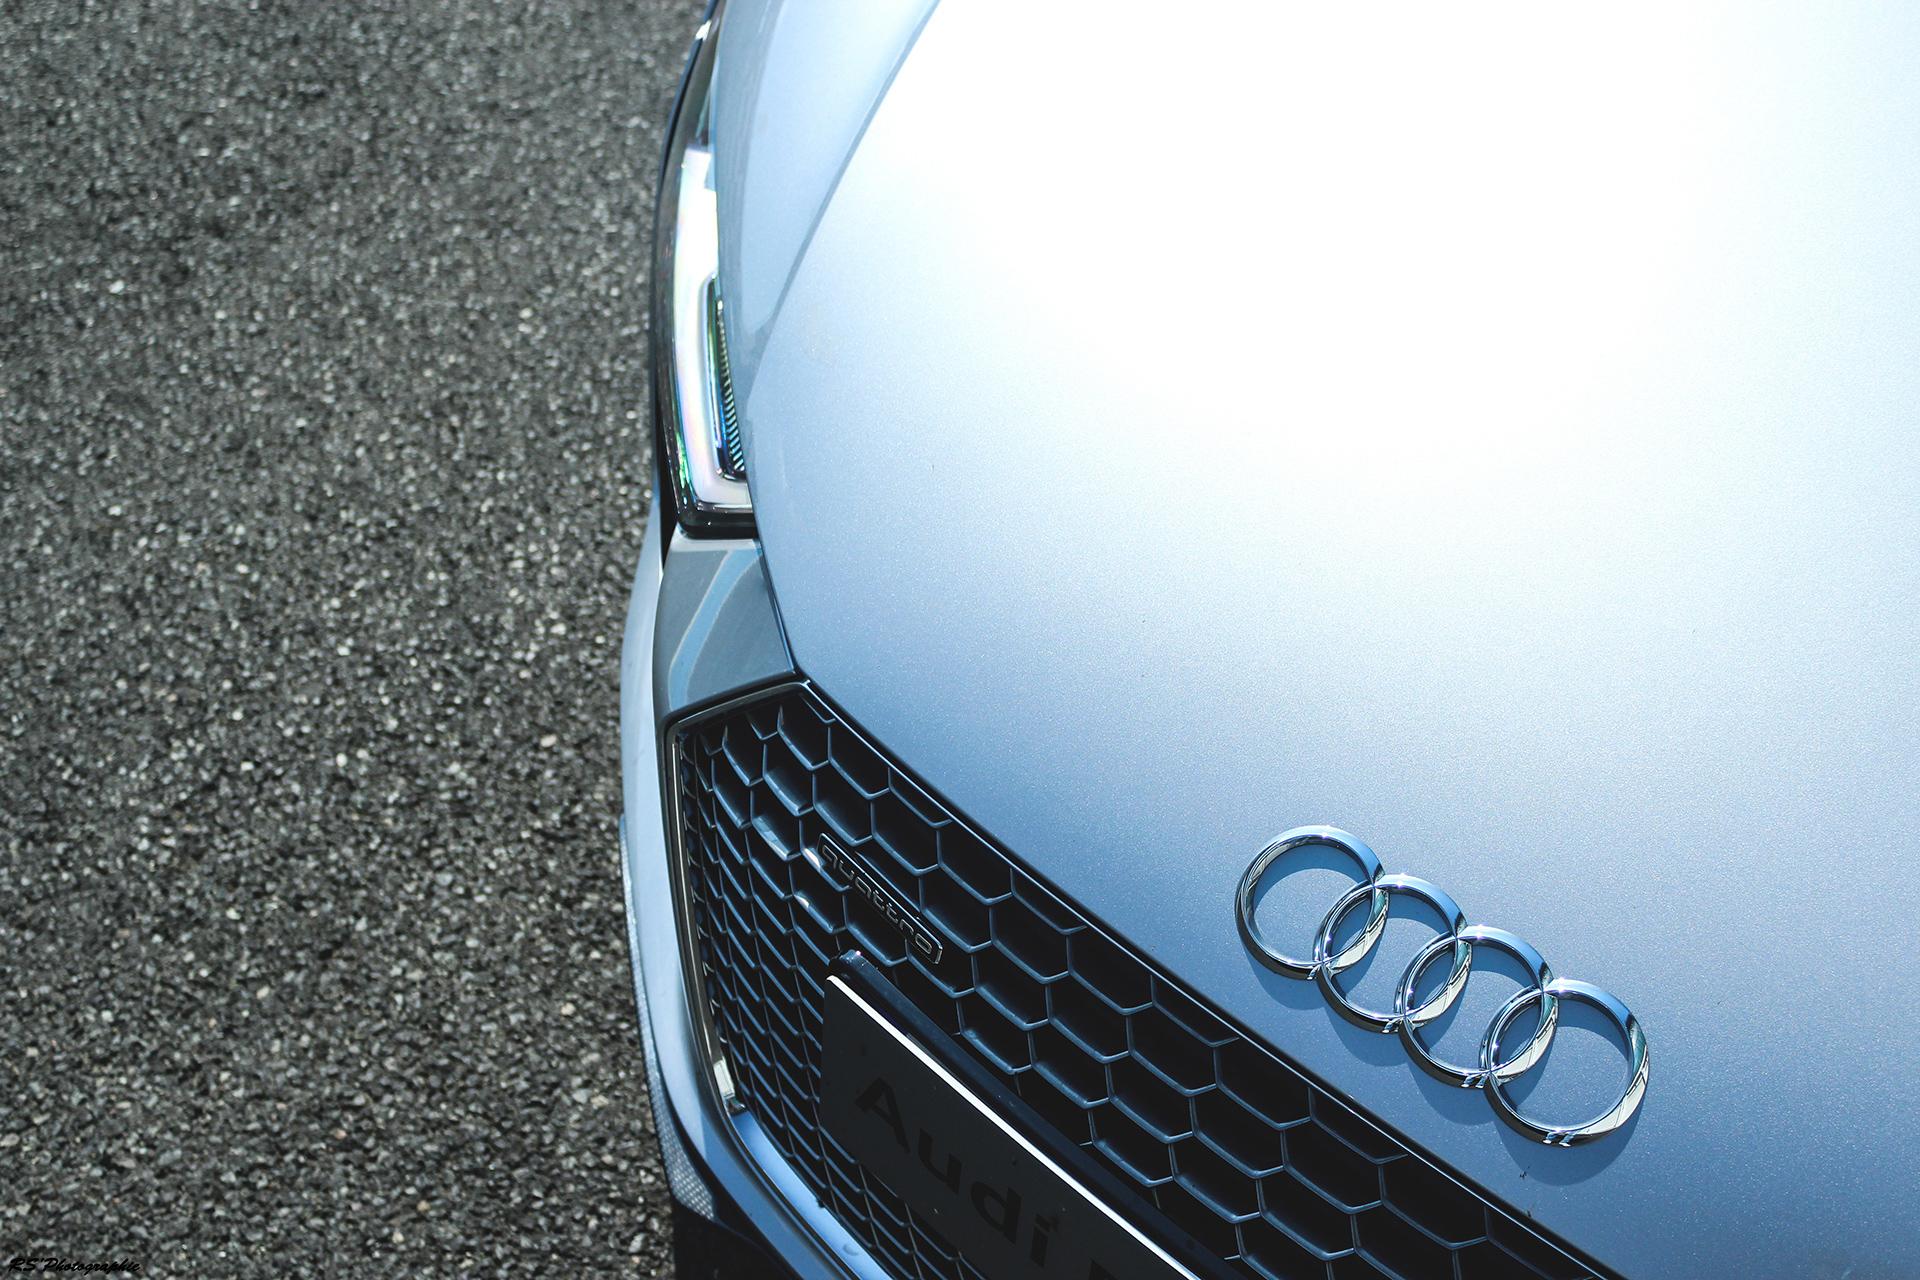 Audi R8 V10 Plus - capot avant / front hood - photo Arnaud Demasier